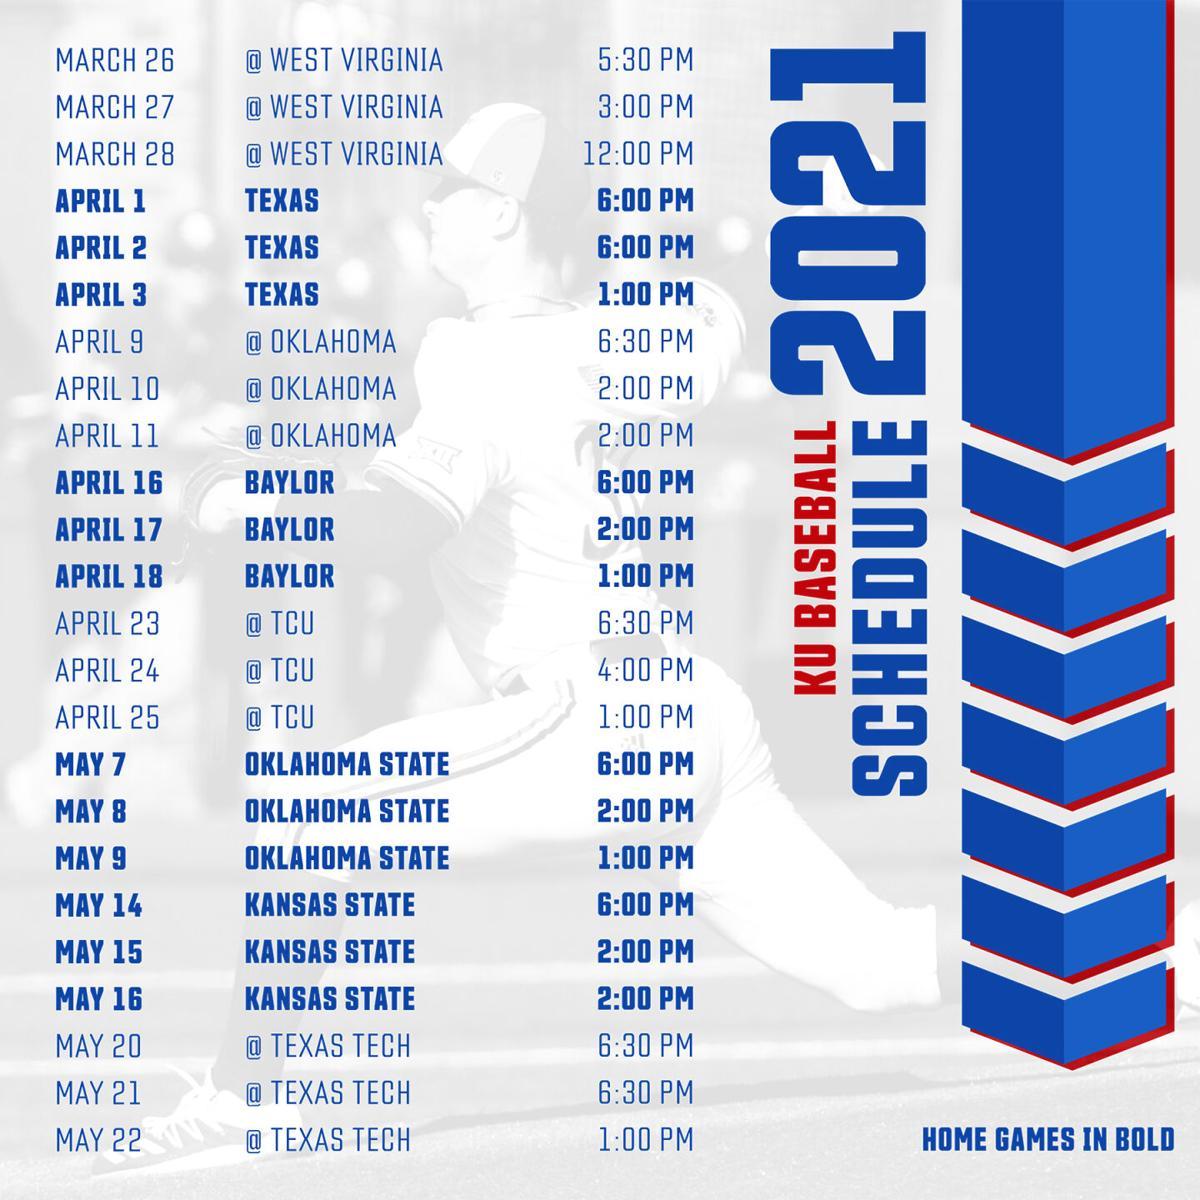 2021 Big 12 Baseball Schedule